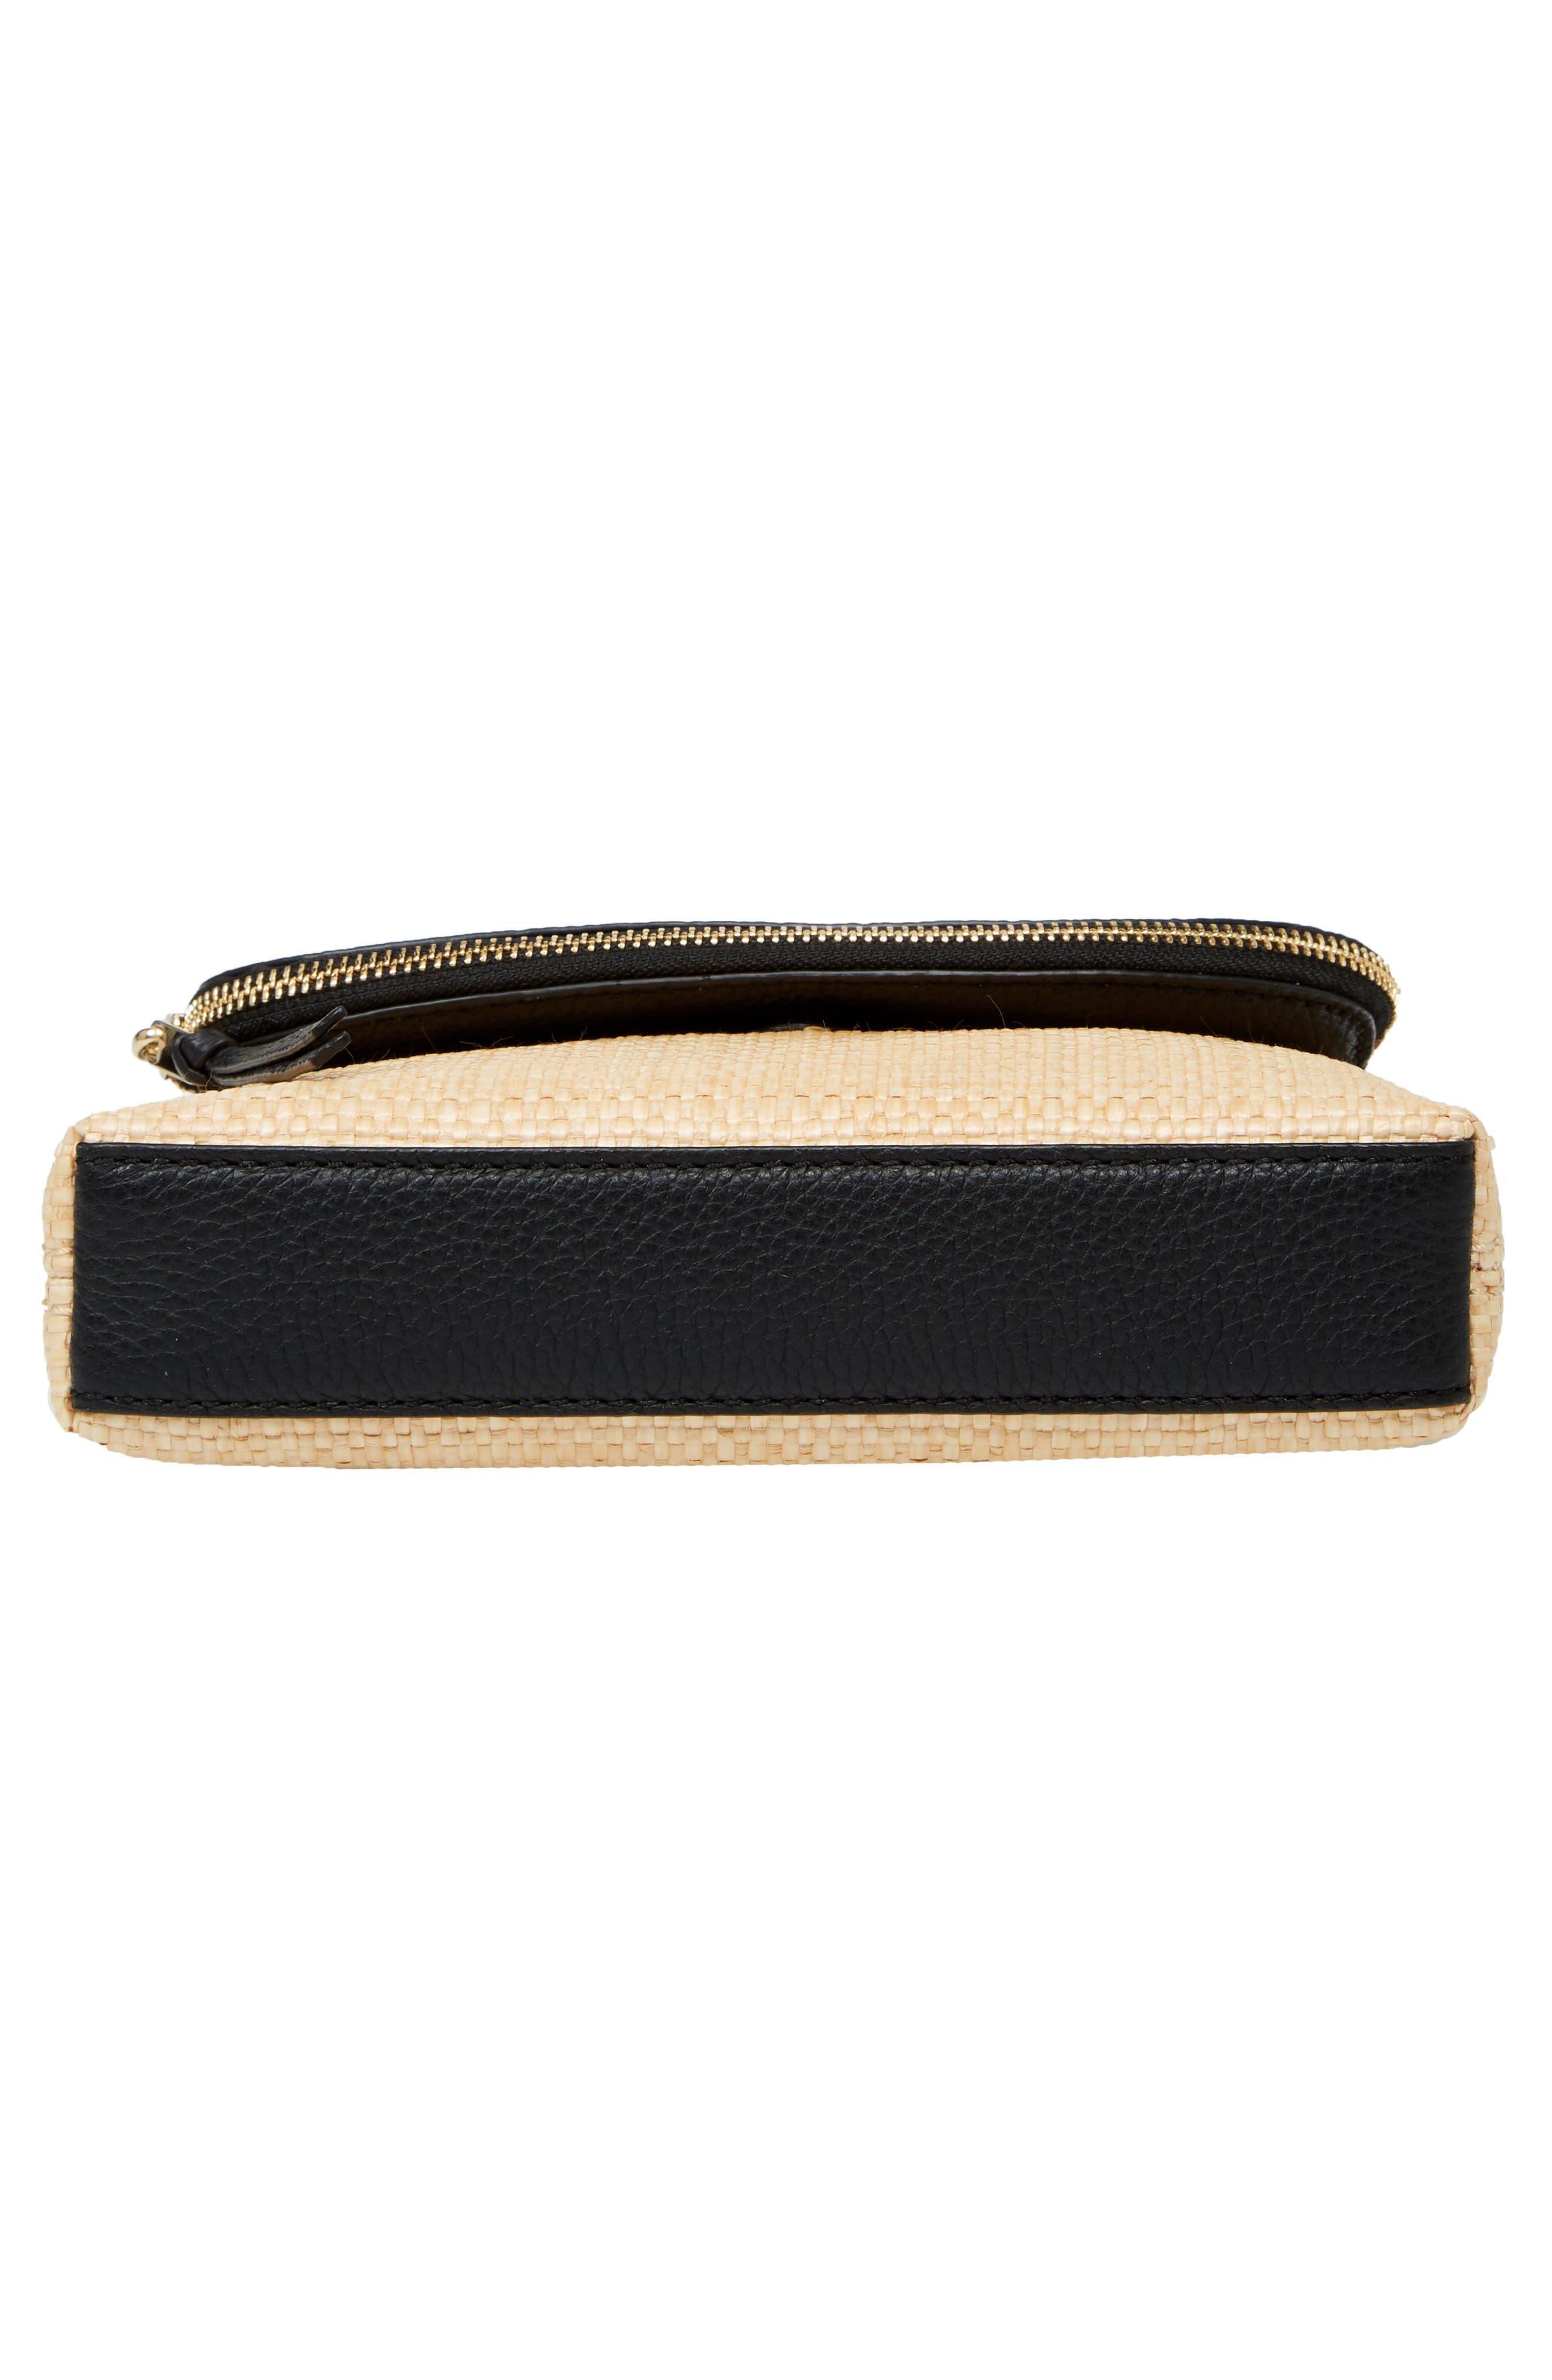 jackson street – harlyn straw & leather crossbody bag,                             Alternate thumbnail 6, color,